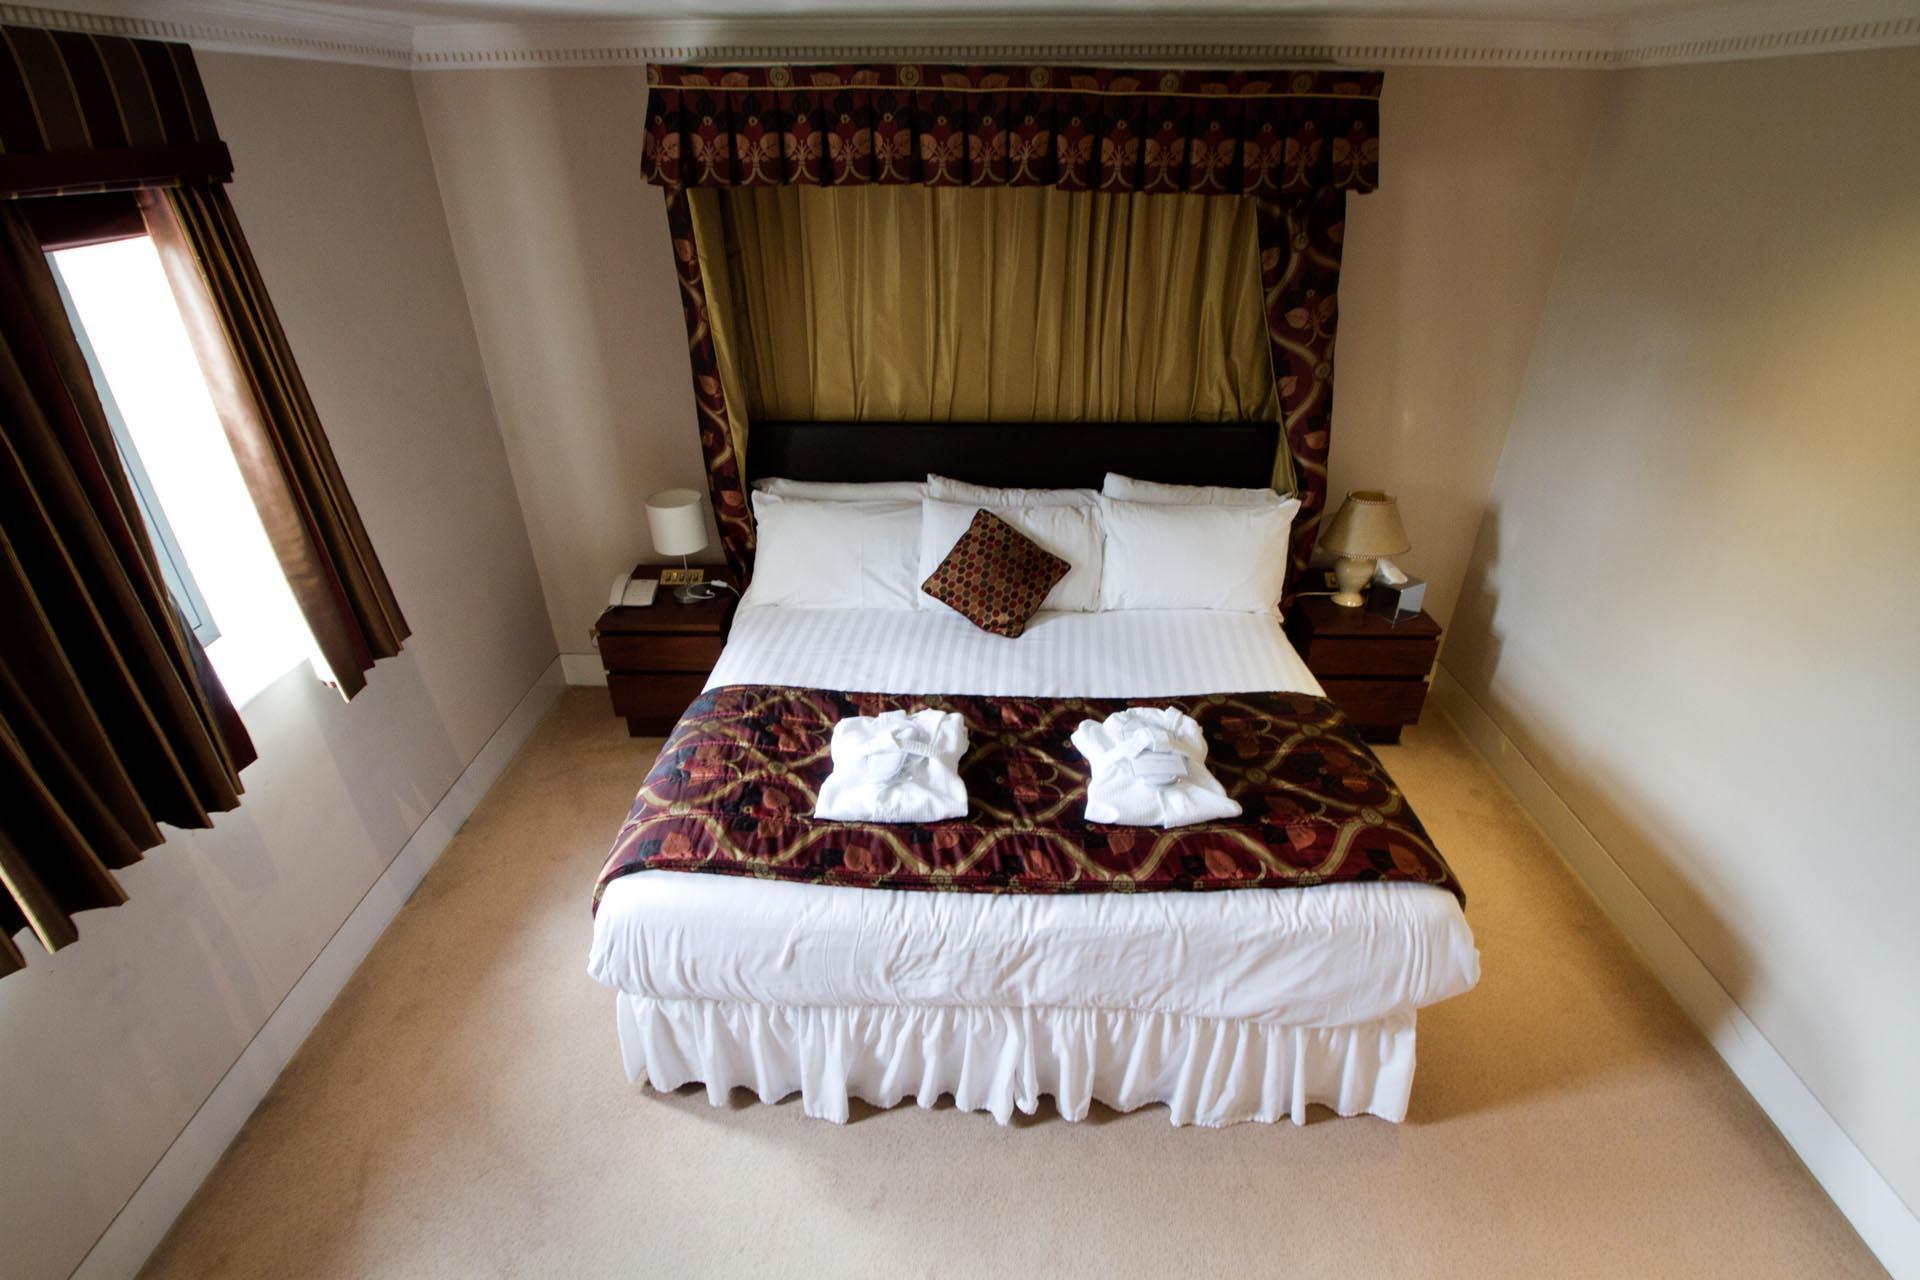 Deans Lodge Junior Suite at Barn Hotel Ruislip near London